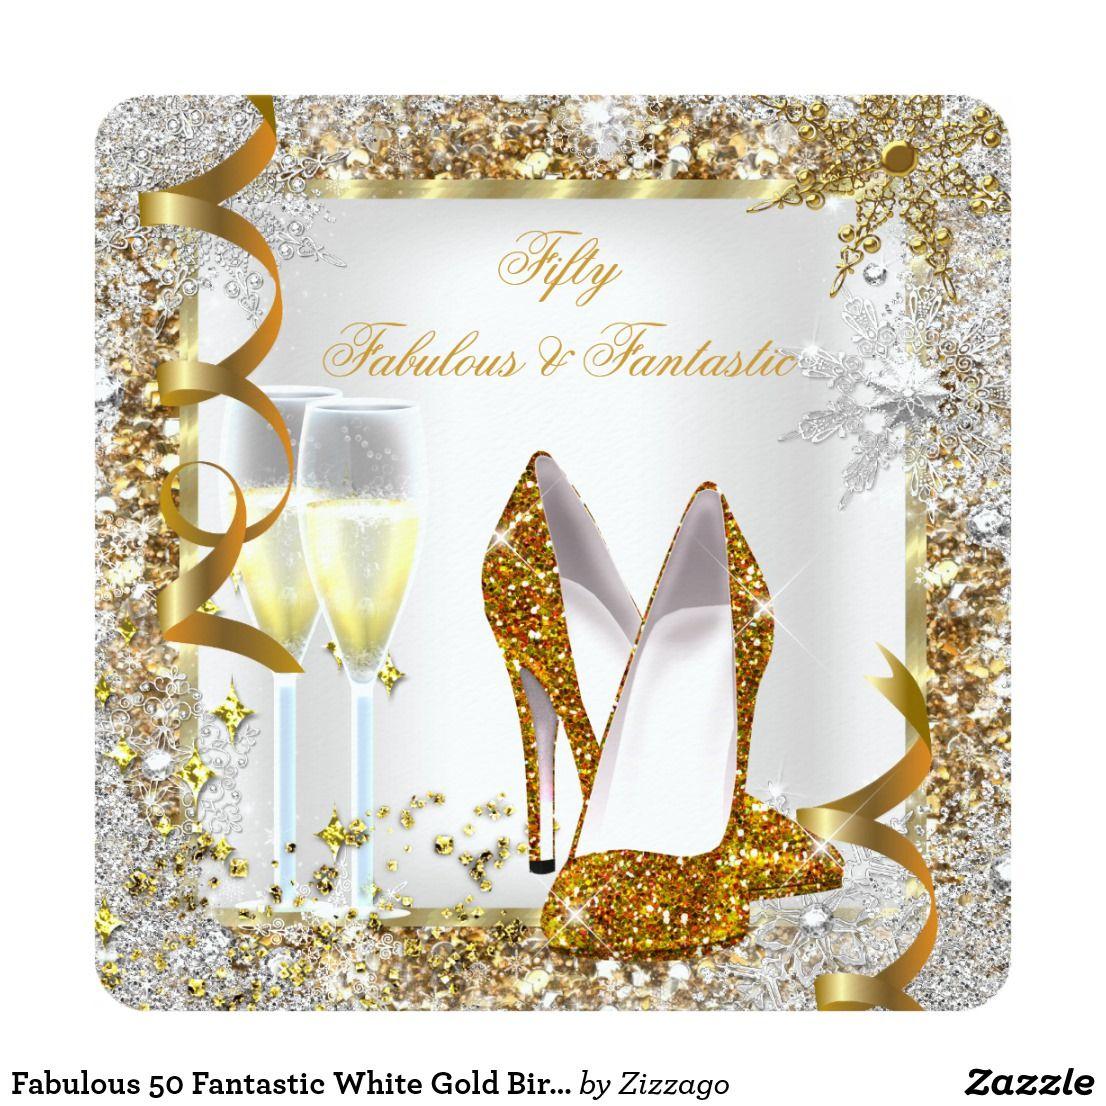 Fabulous 50 Fantastic White Gold Birthday Party Invitation